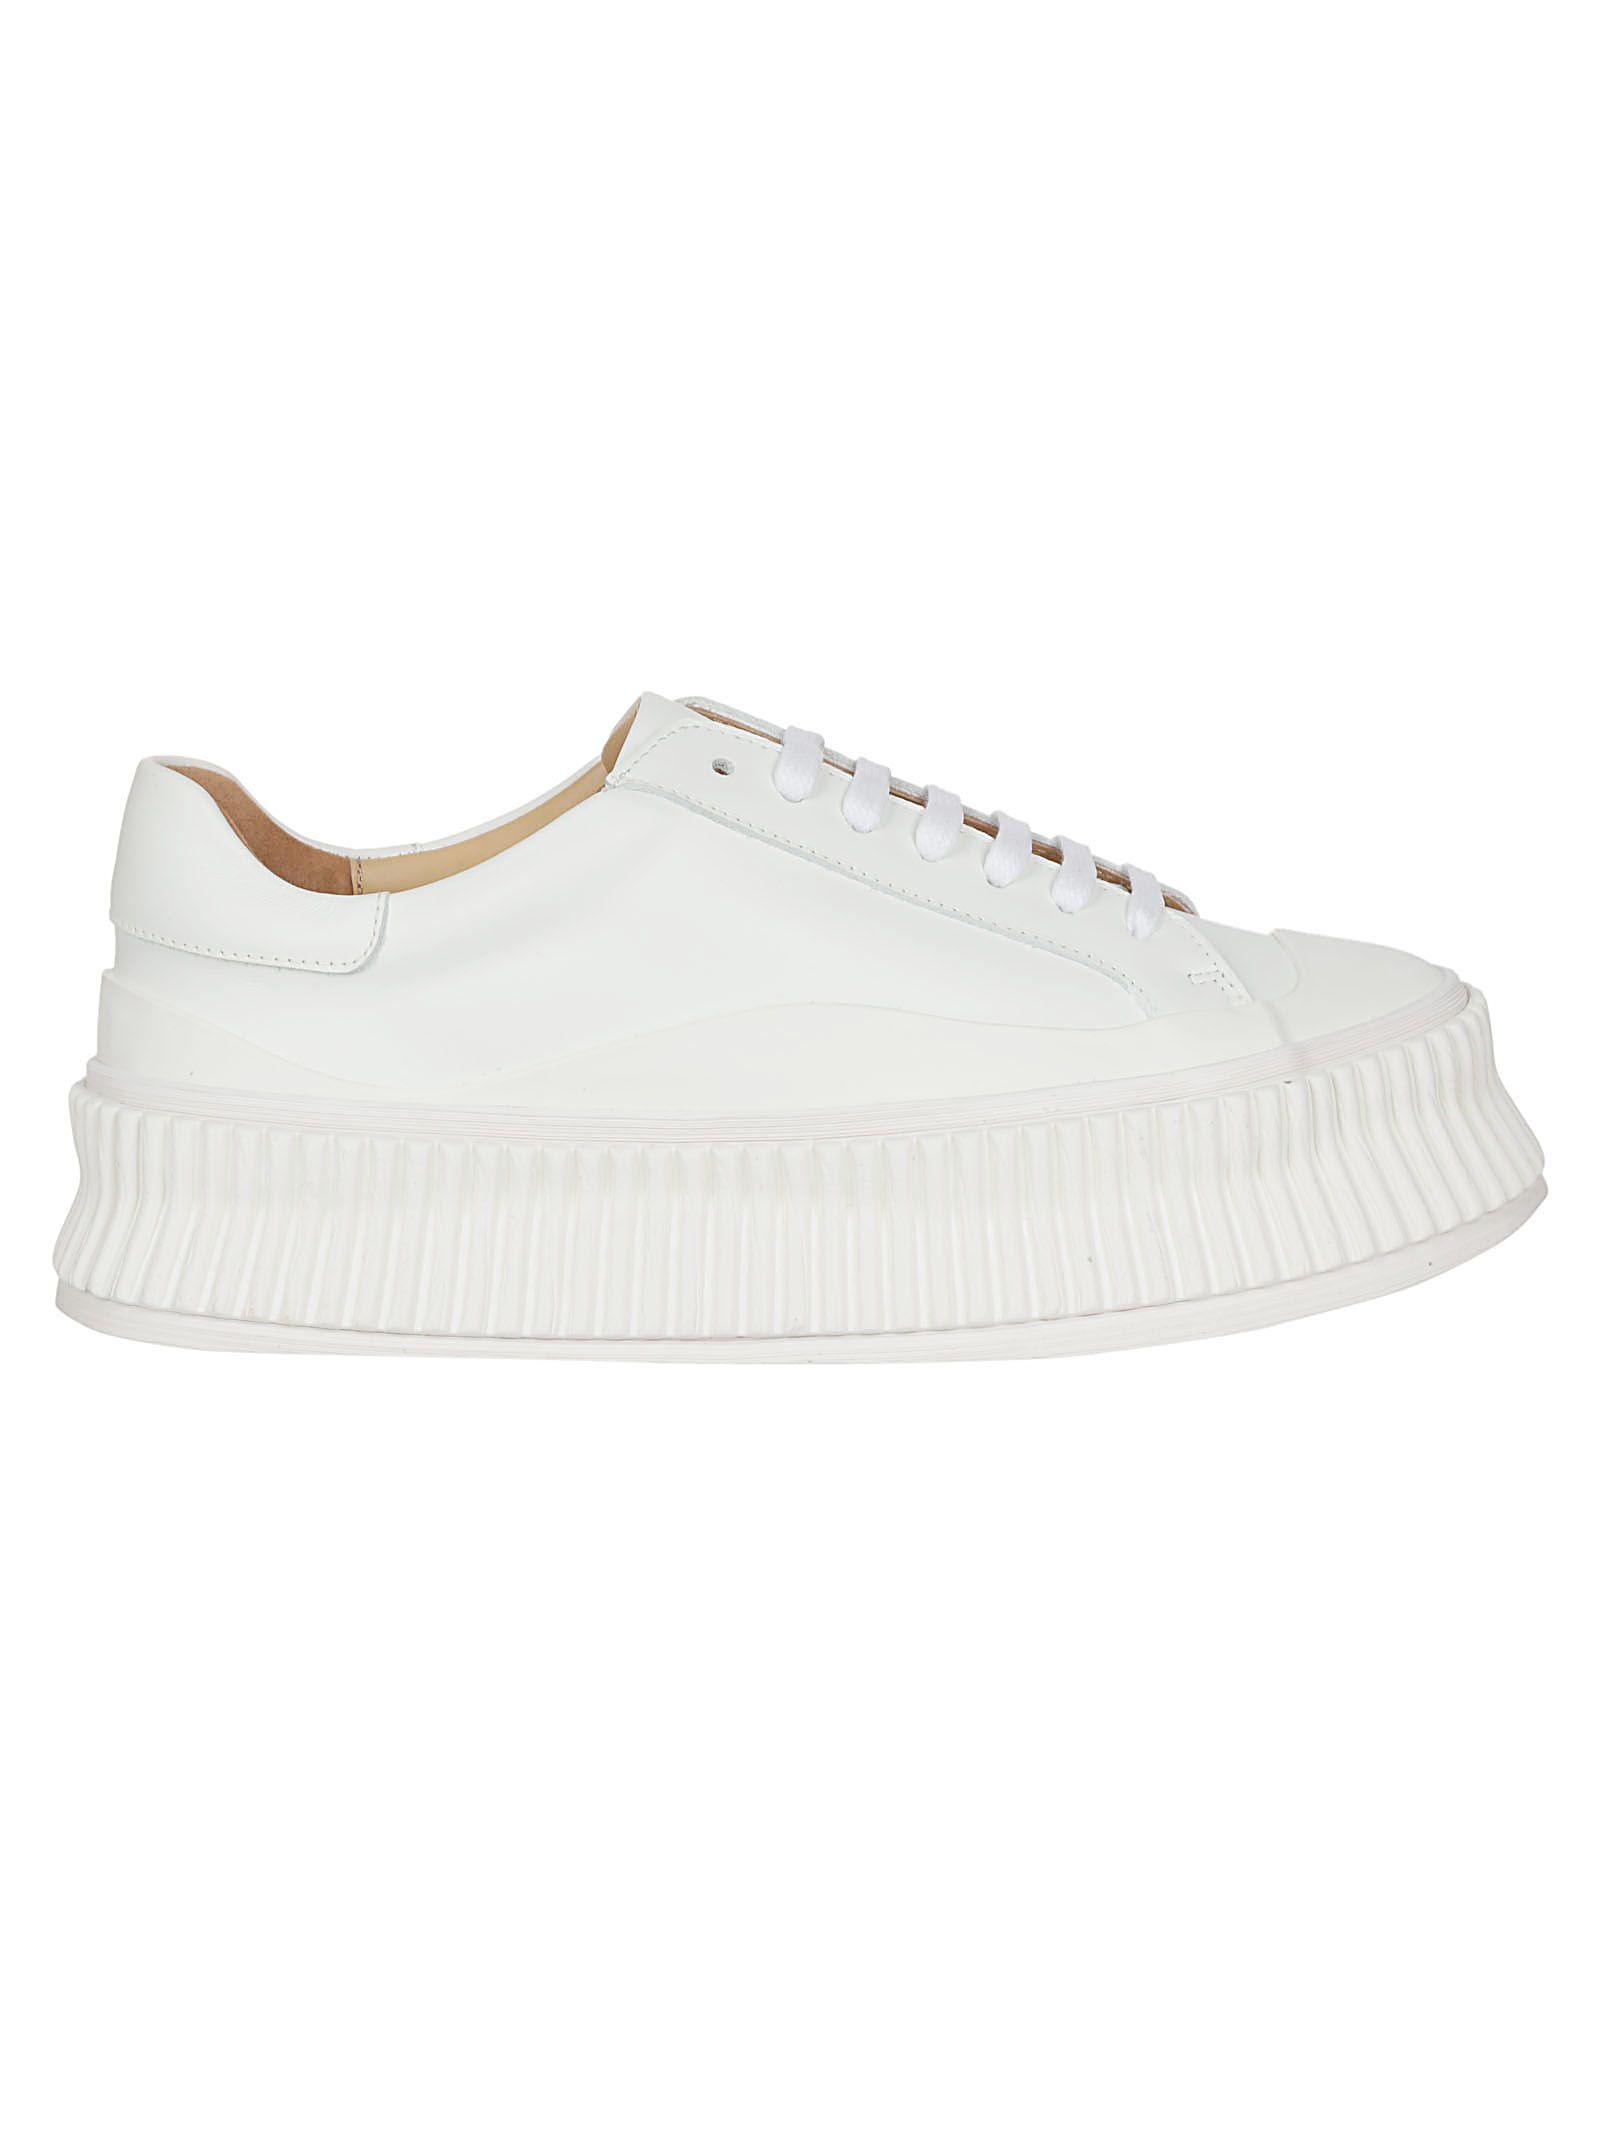 Jil Sander Connors Platform Sneakers